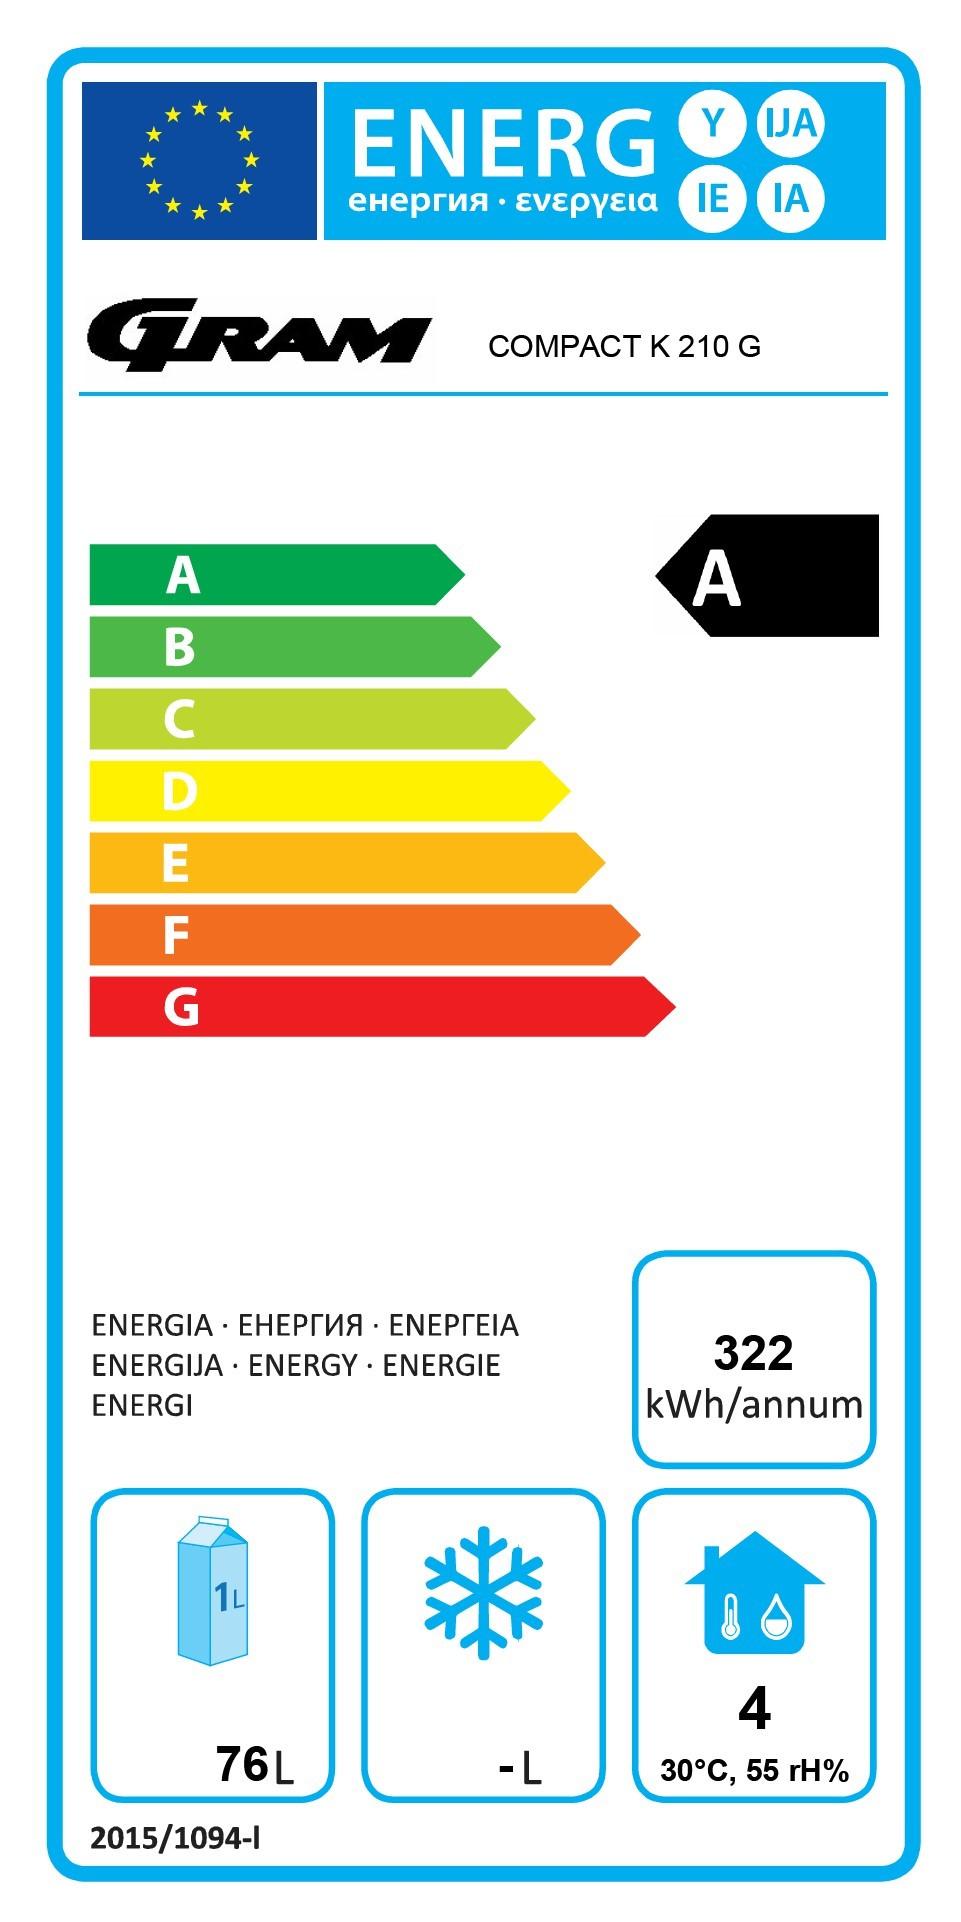 COMPACT K 210 RG 3N 125 Ltr Stainless Steel Undercounter Fridge Energy Rating